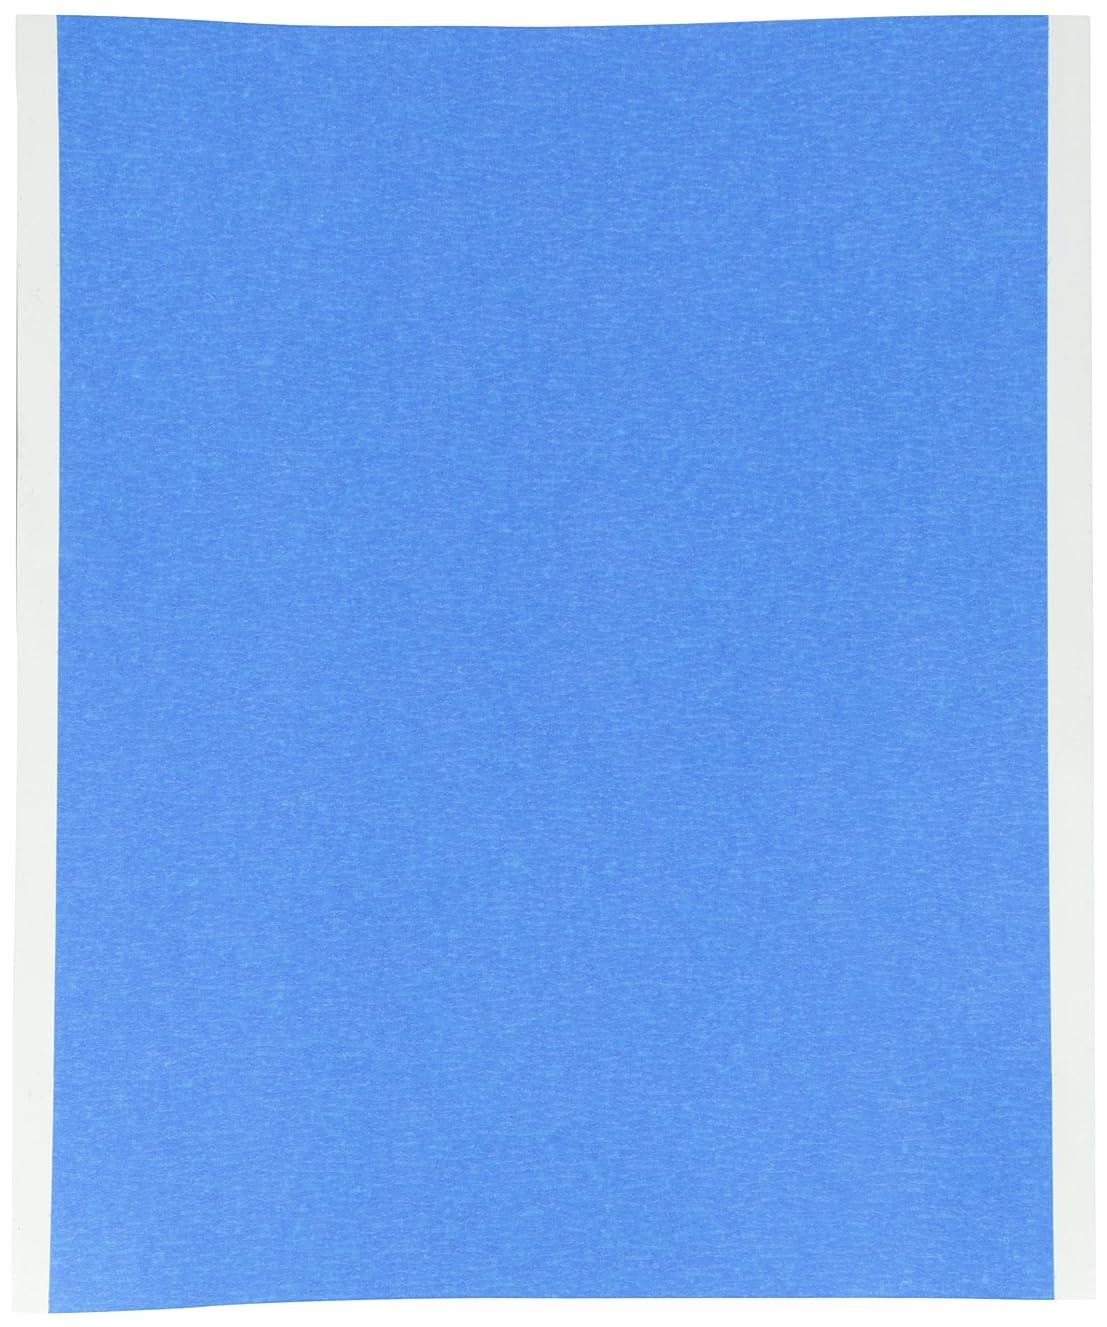 3M 2090?Long-Mask Masking Tape [Pack of 100] - 8.25 in. (W) x 10.5 in. (L) 3D Printer Sheets - Masking Tape Strip for Medium Adhesion